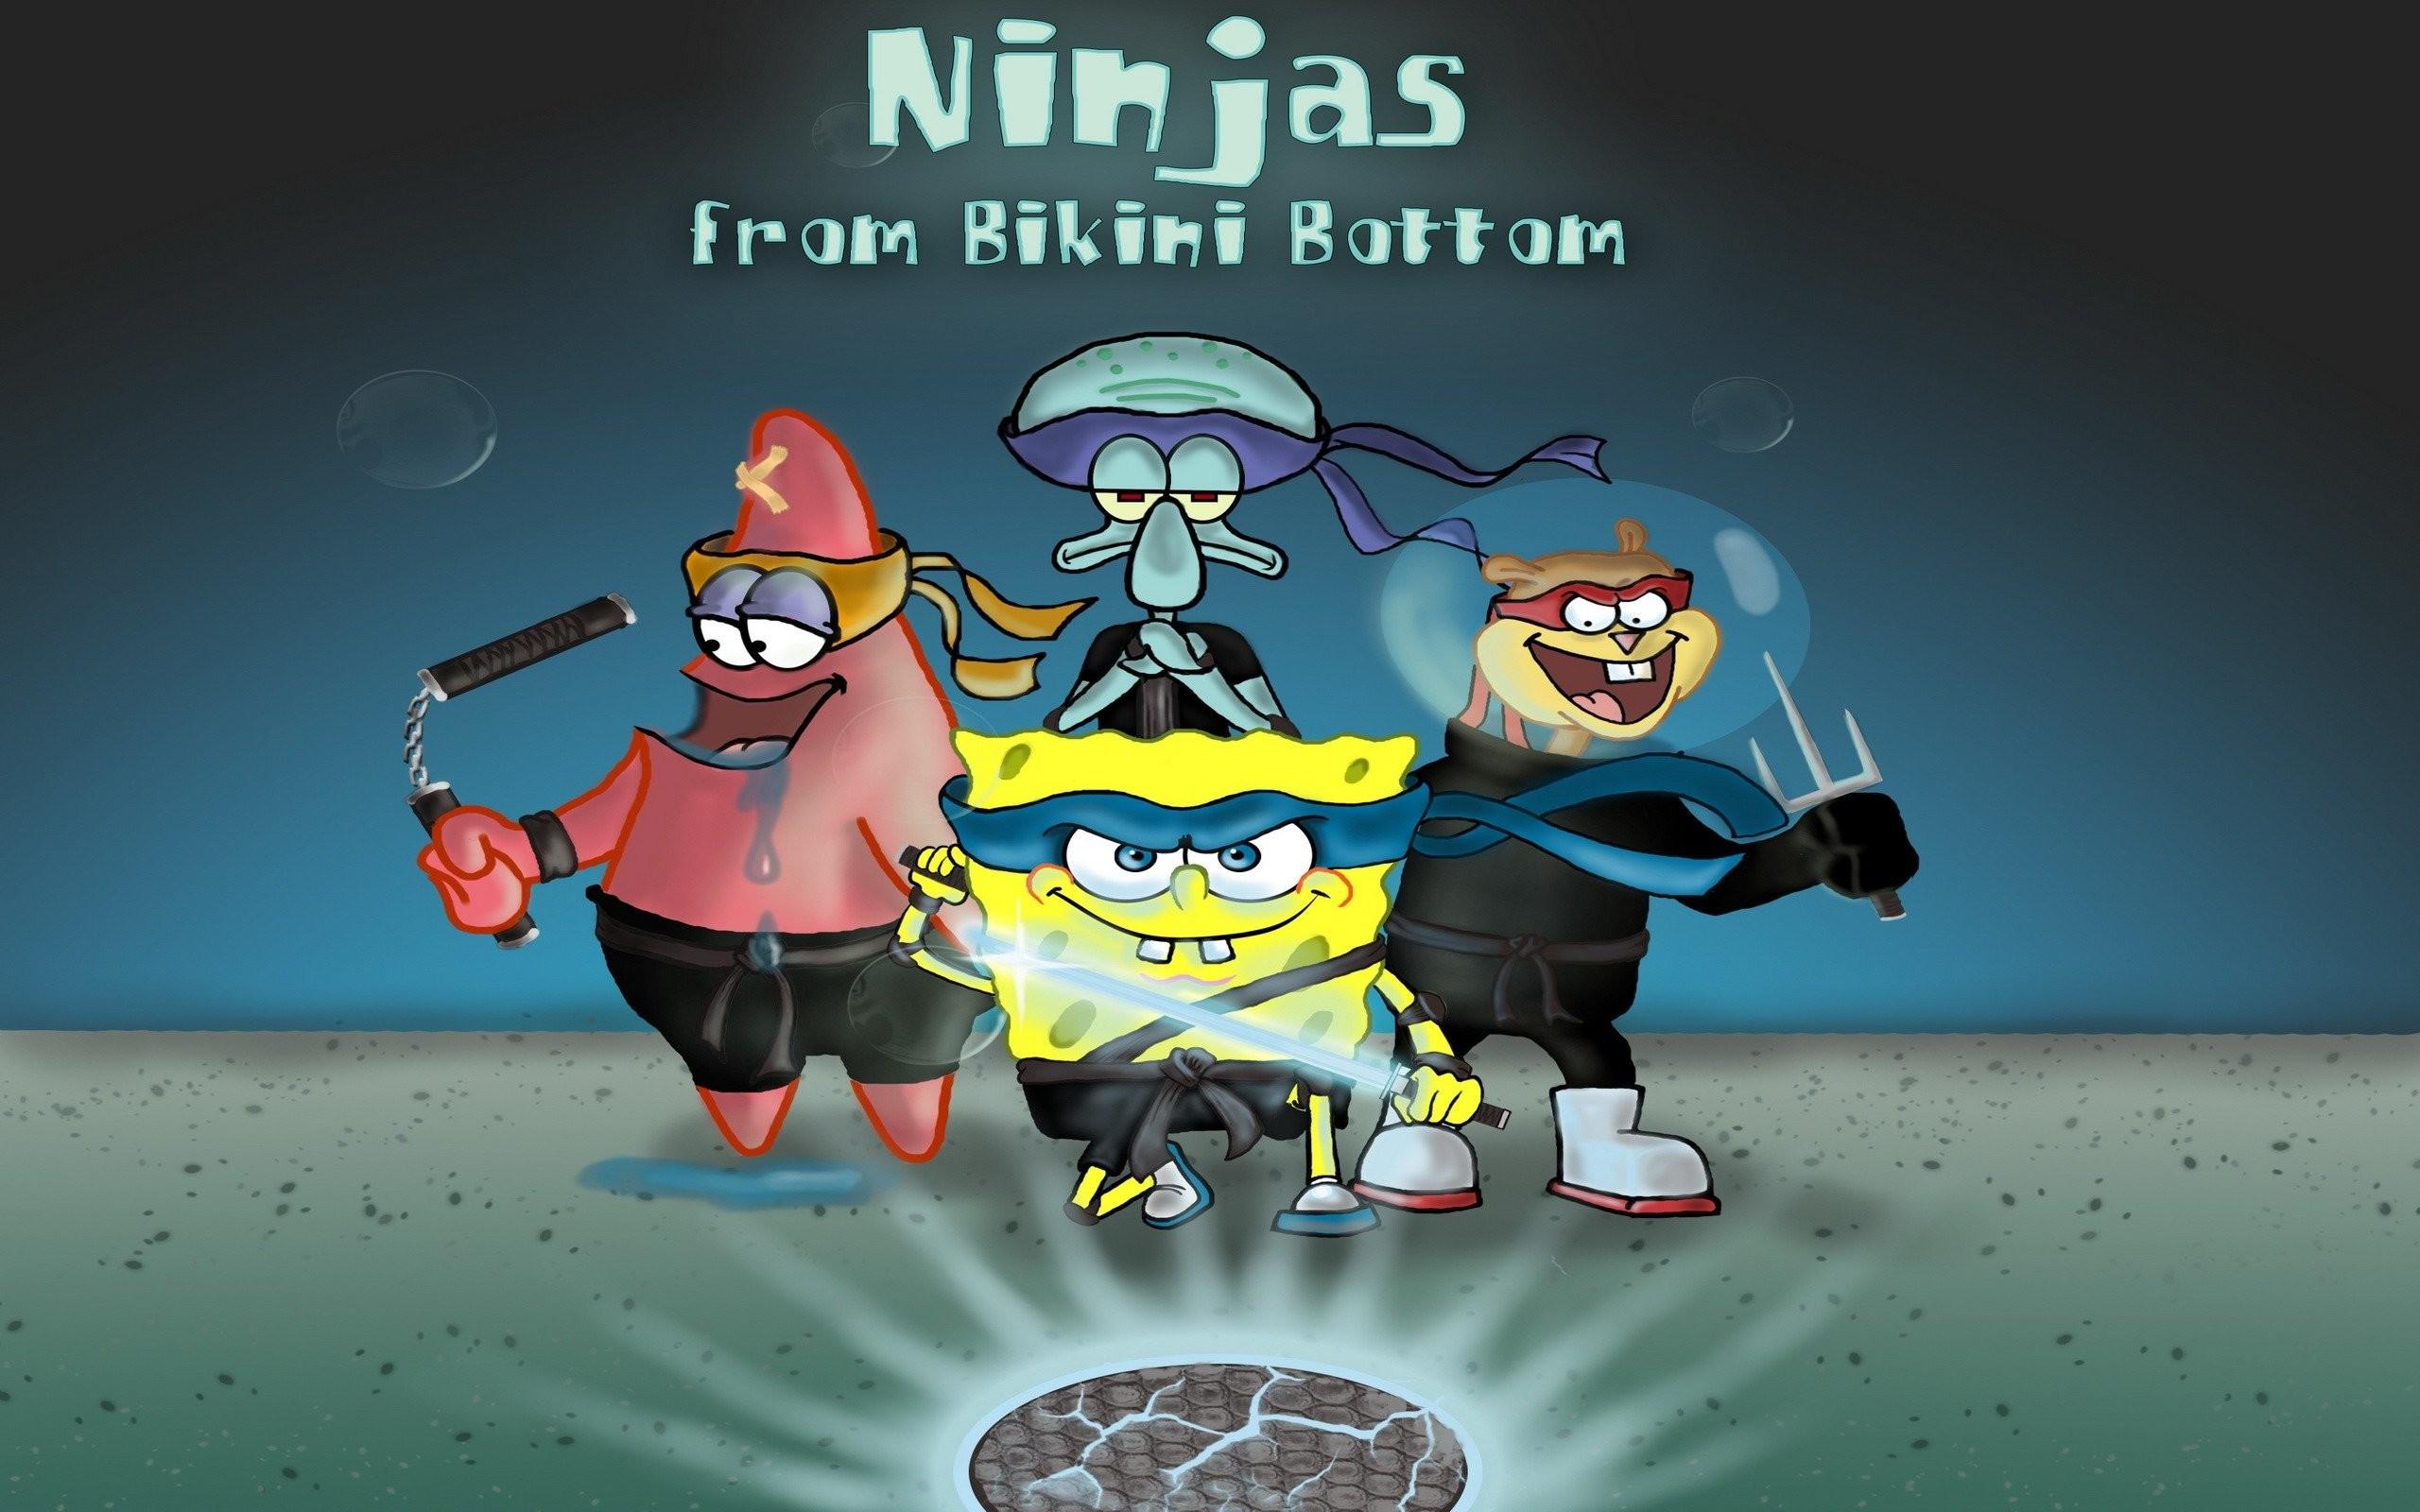 Ninjas From Bikini Bottom. SHARE. TAGS: Patrick SpongeBob SquarePants  Spongebob